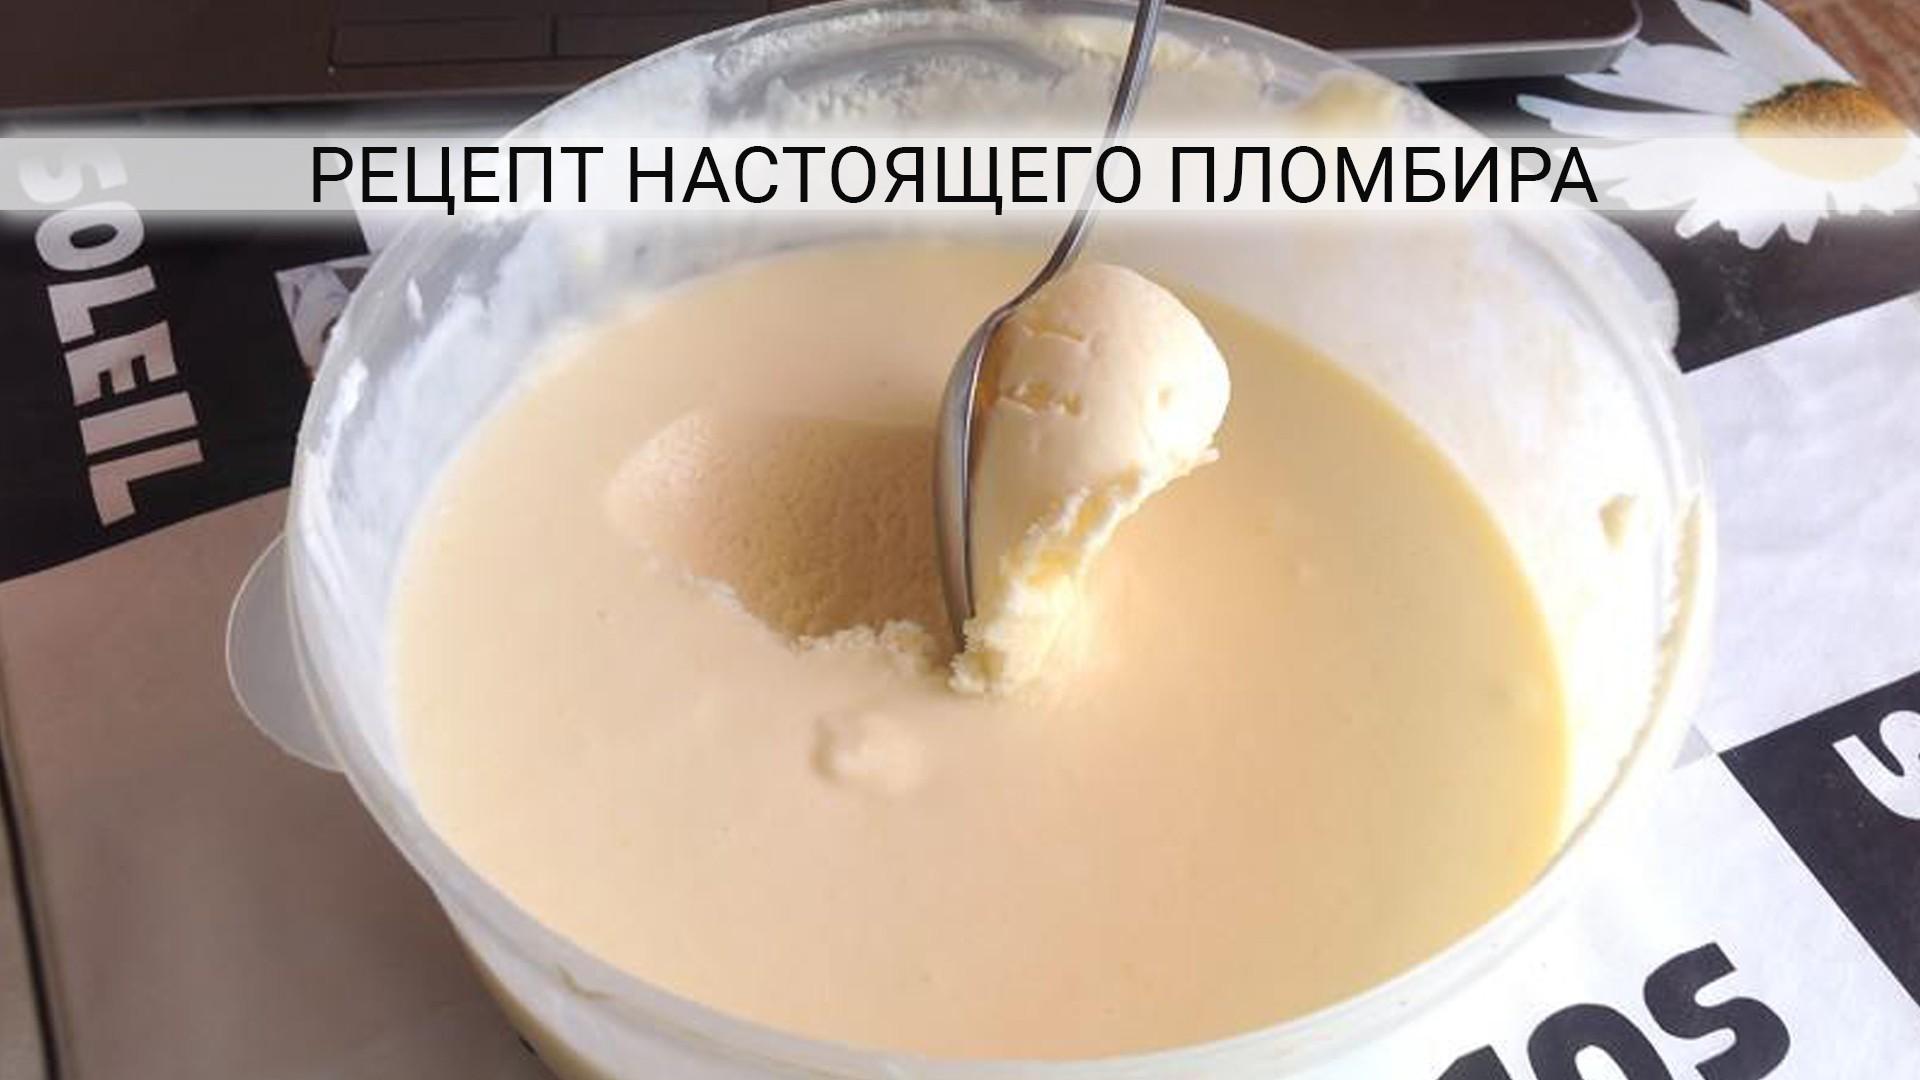 Приготовить мороженое